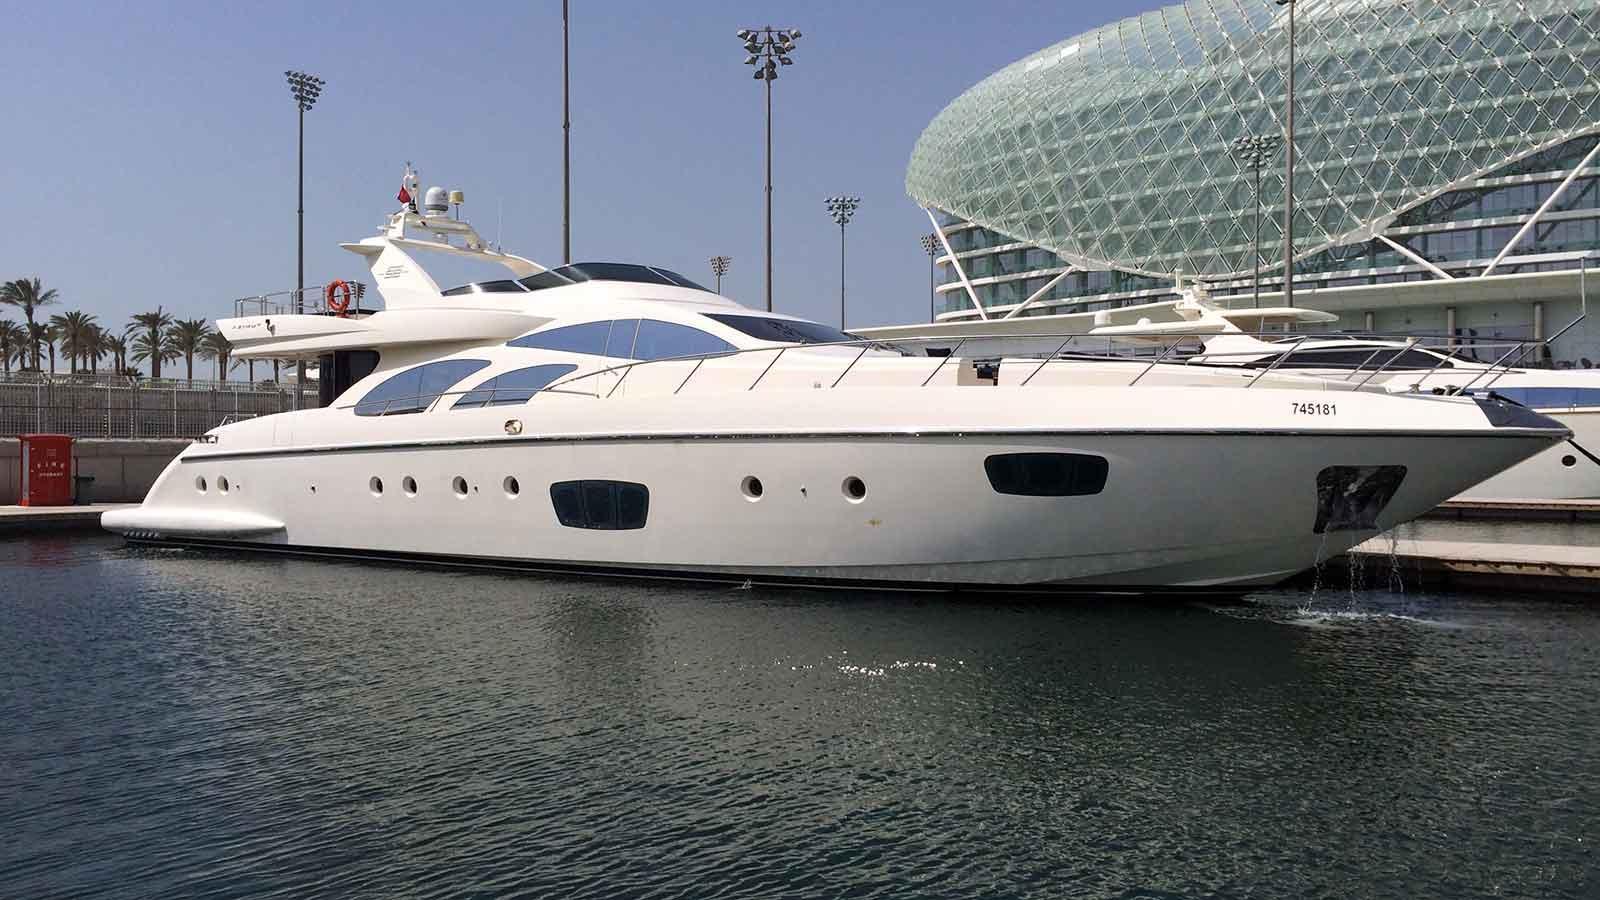 Viceroy Yacht Exterior